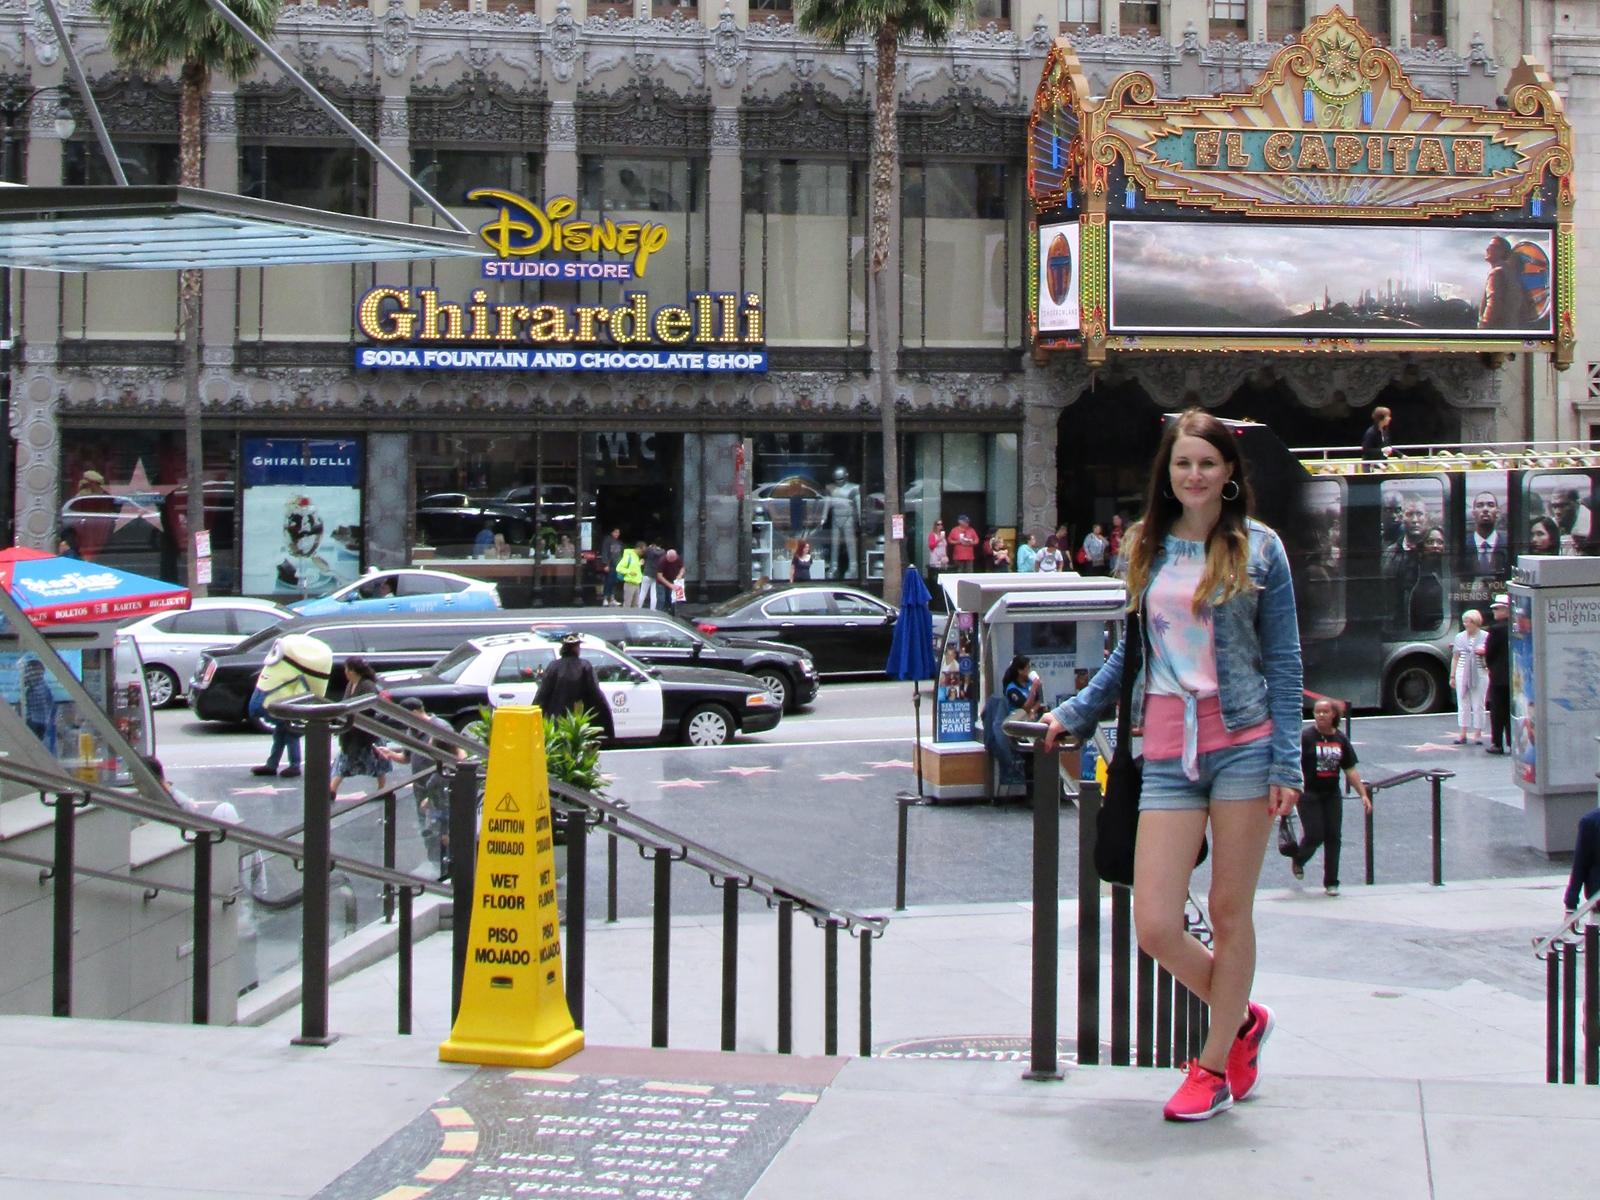 Hollywood Chirardelli - USA Roadtrip - Amerika Rundreise - Fashionladyloves by Tamara Wagner - Travelblog